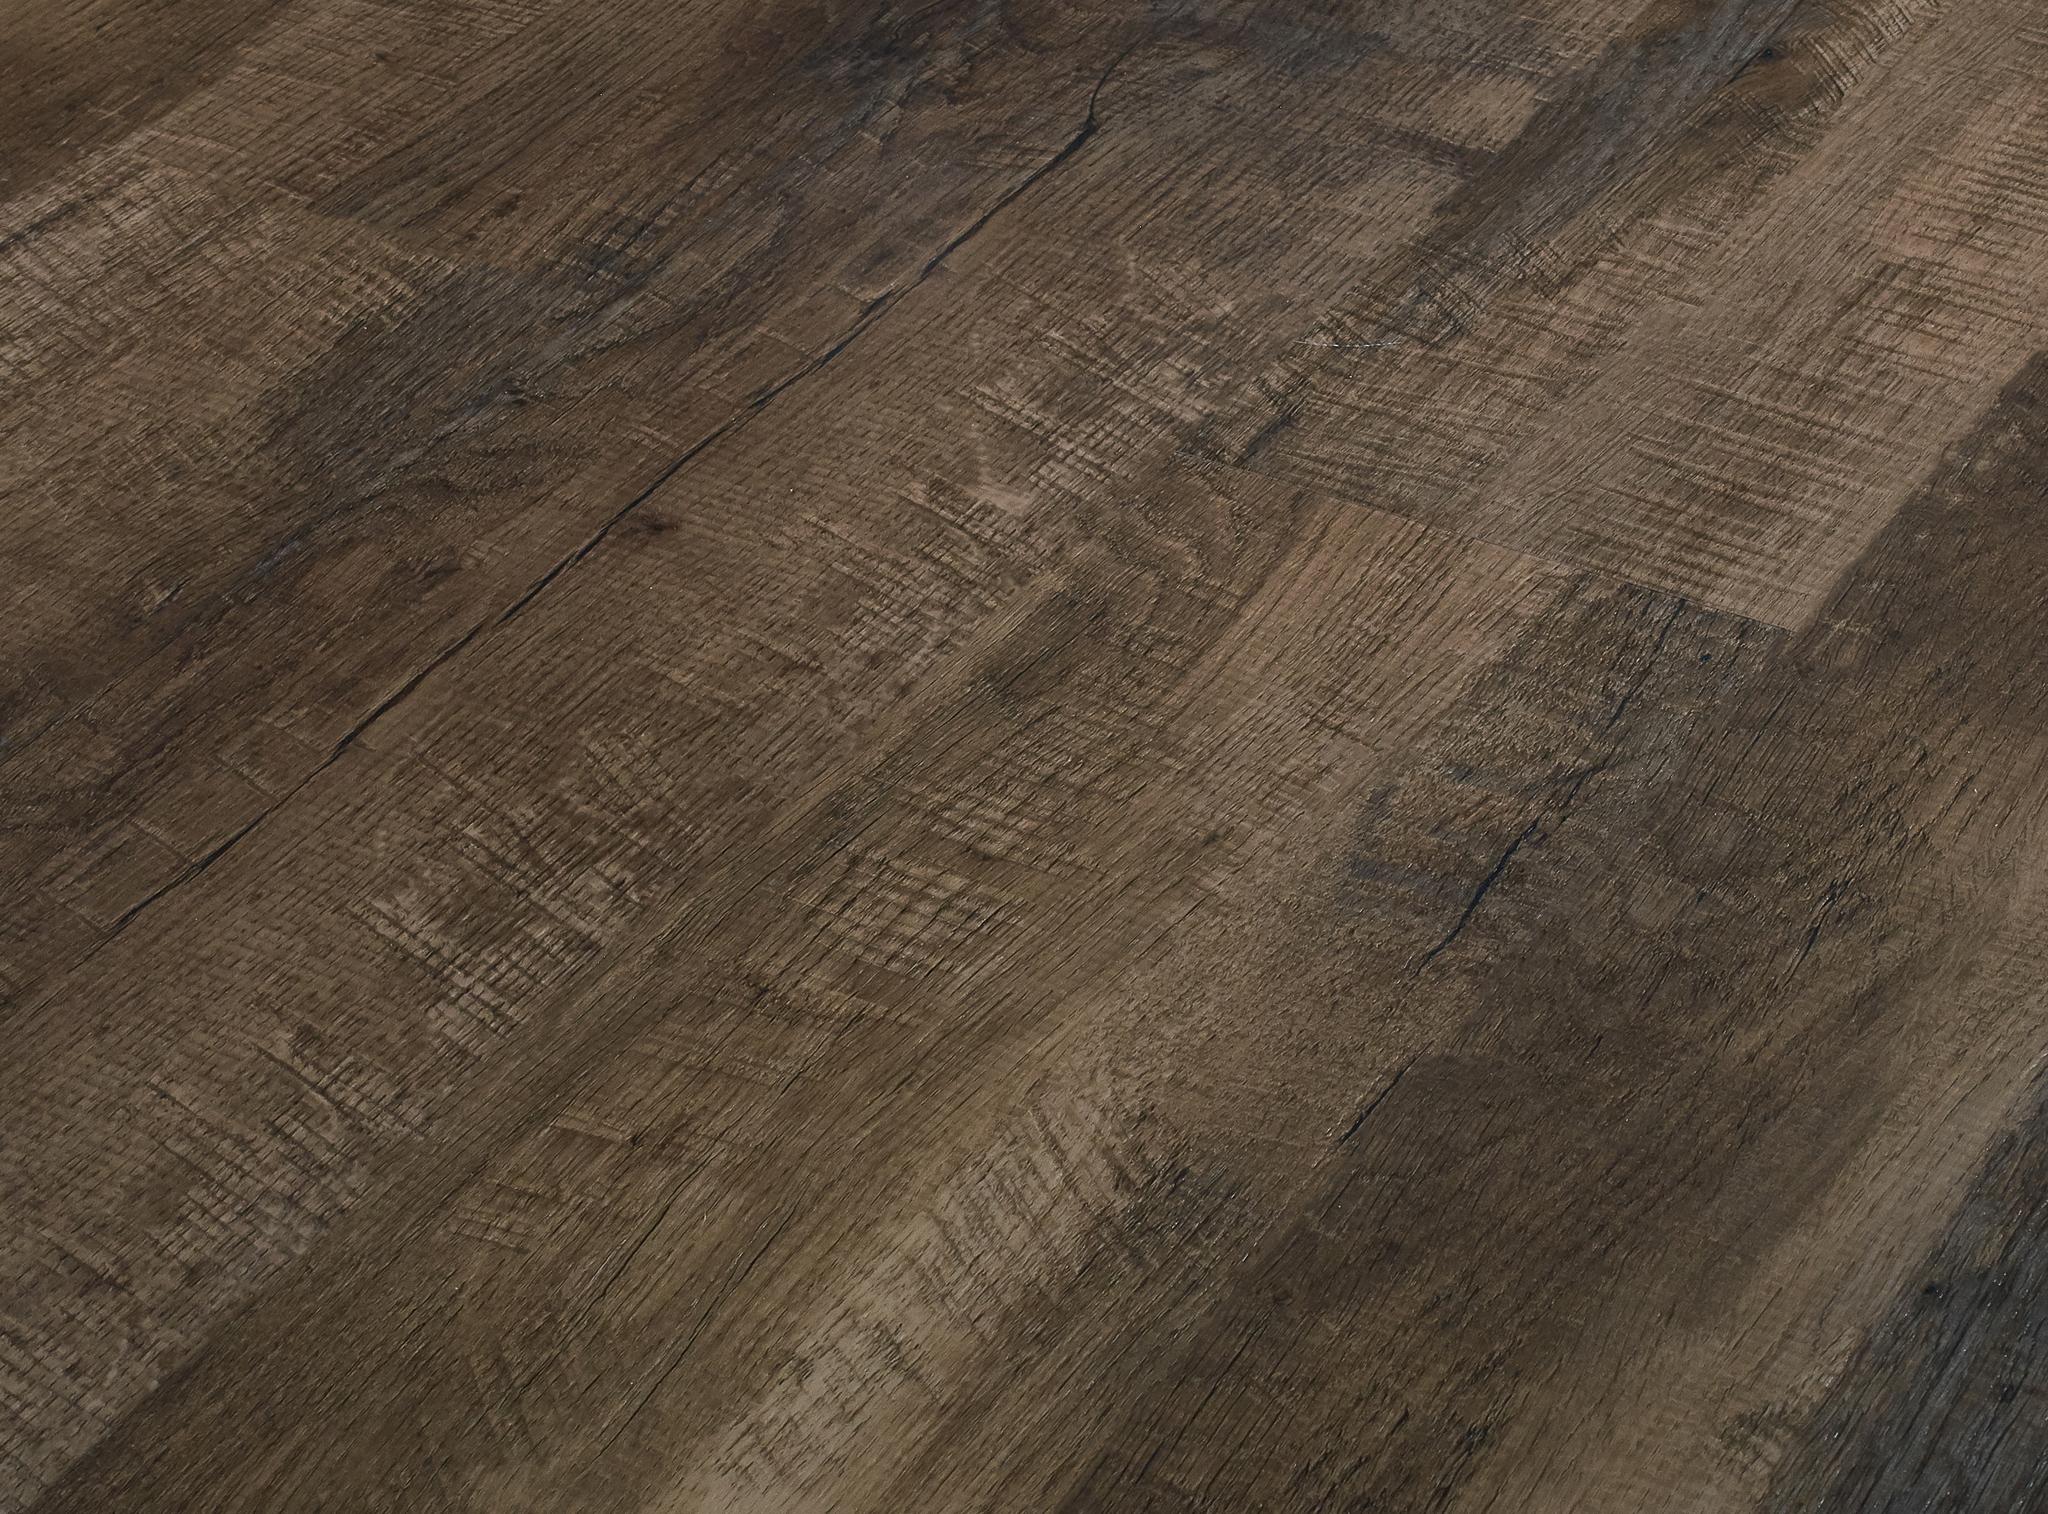 Виниловый пол Concept Floor - Premium Line Eiche Rustic (Дуб Rustic)